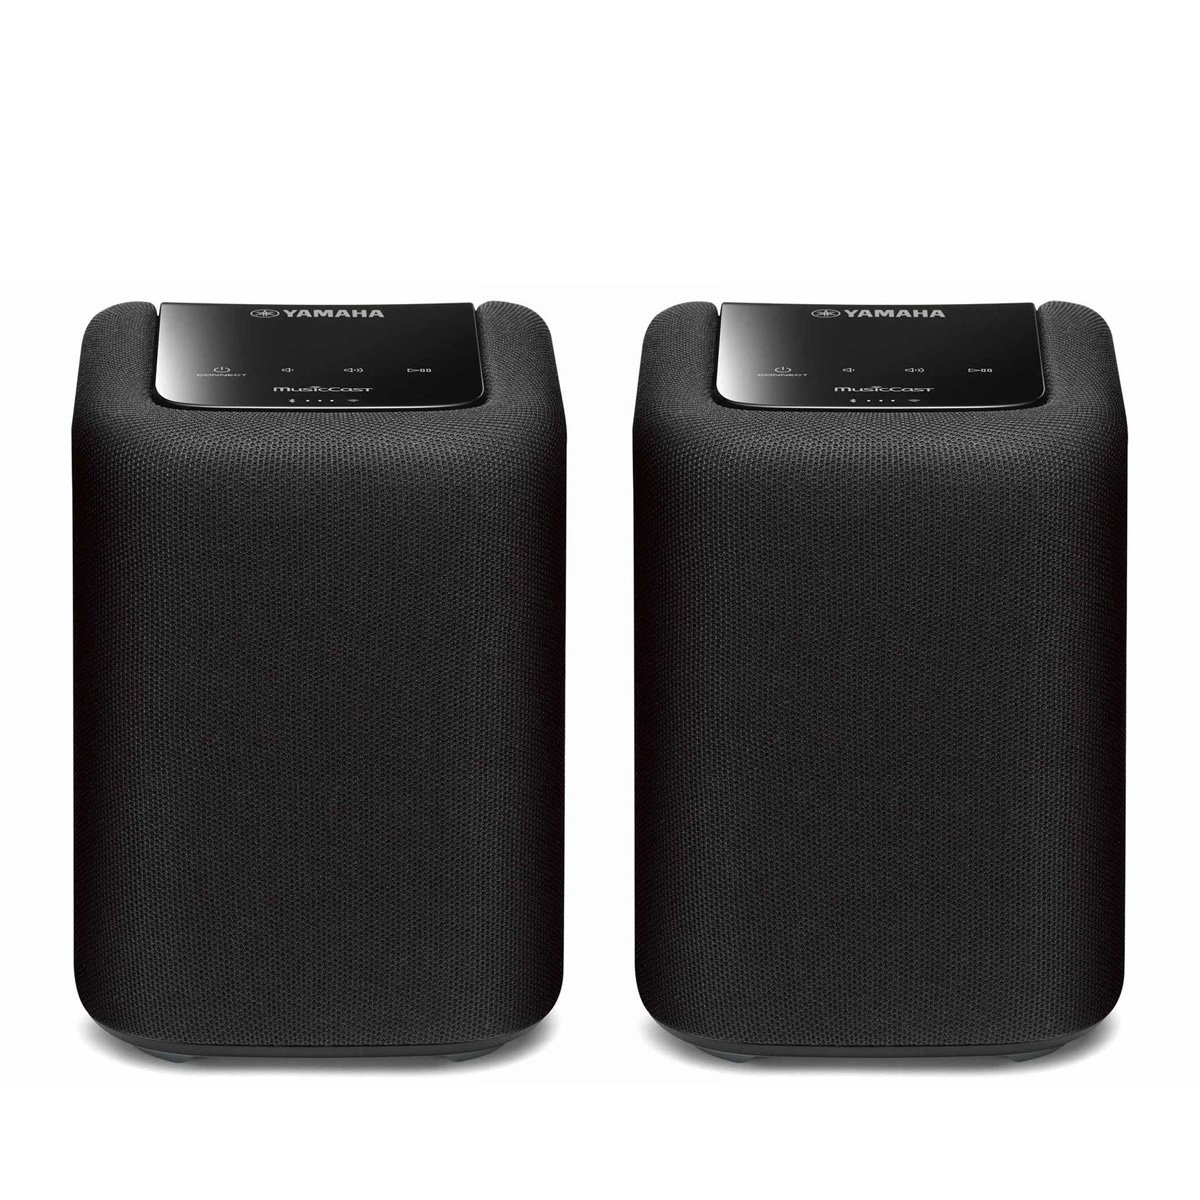 Yamaha WX-010 MusicCast Wireless Speaker - Pair (Black)